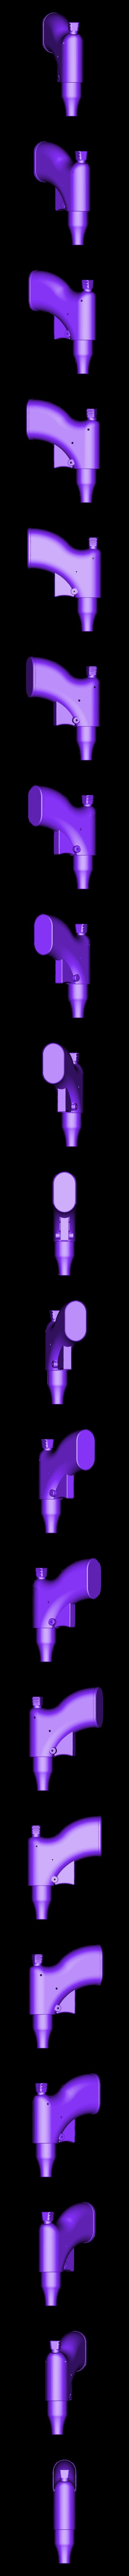 The_Deer_Gun_Combined.stl Download free STL file The Deer Gun (Historical Prop) • Object to 3D print, MuSSy